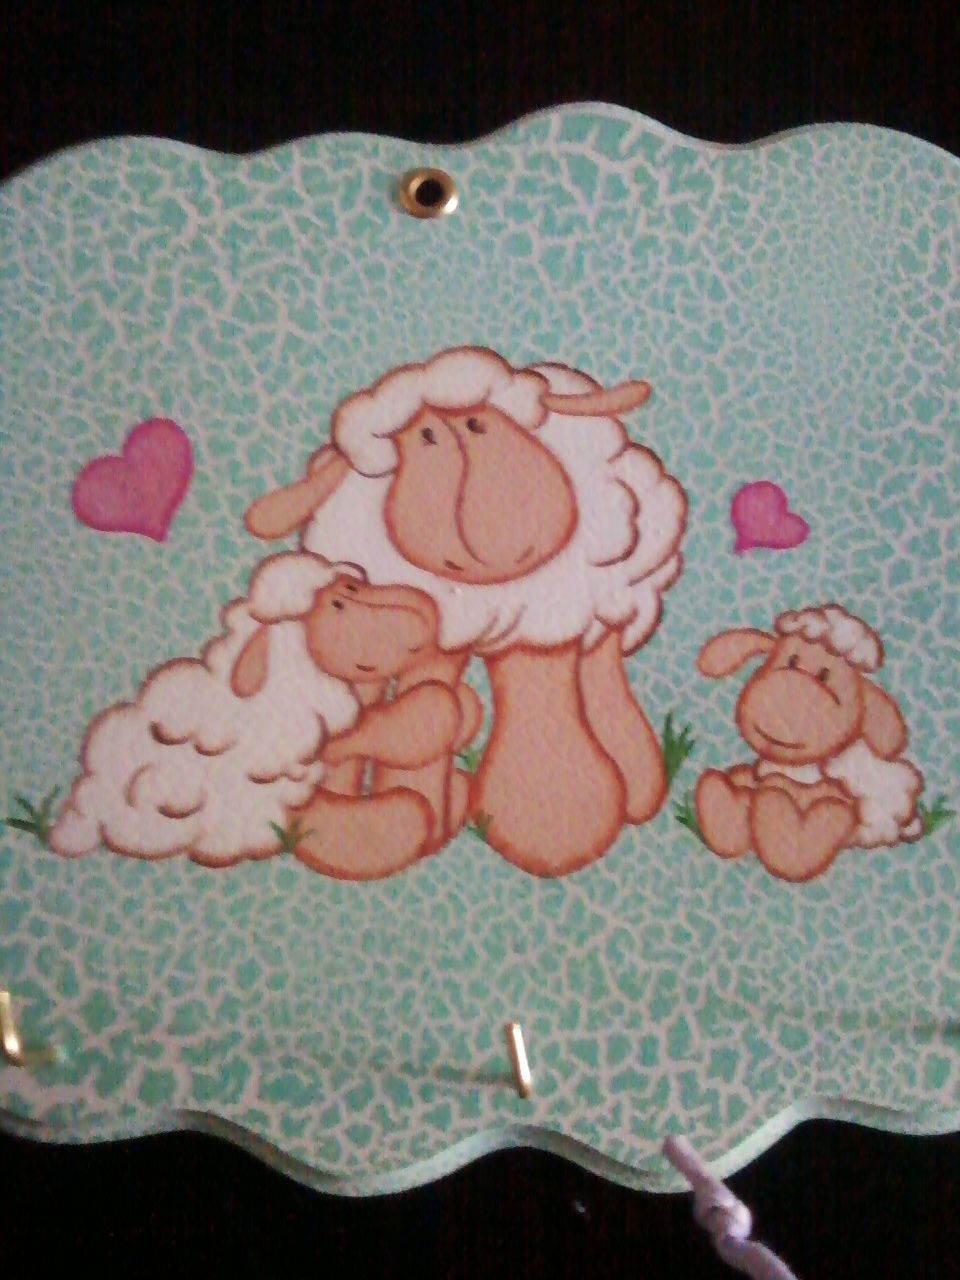 Porta llaves ovejitas / Dulces Detalles